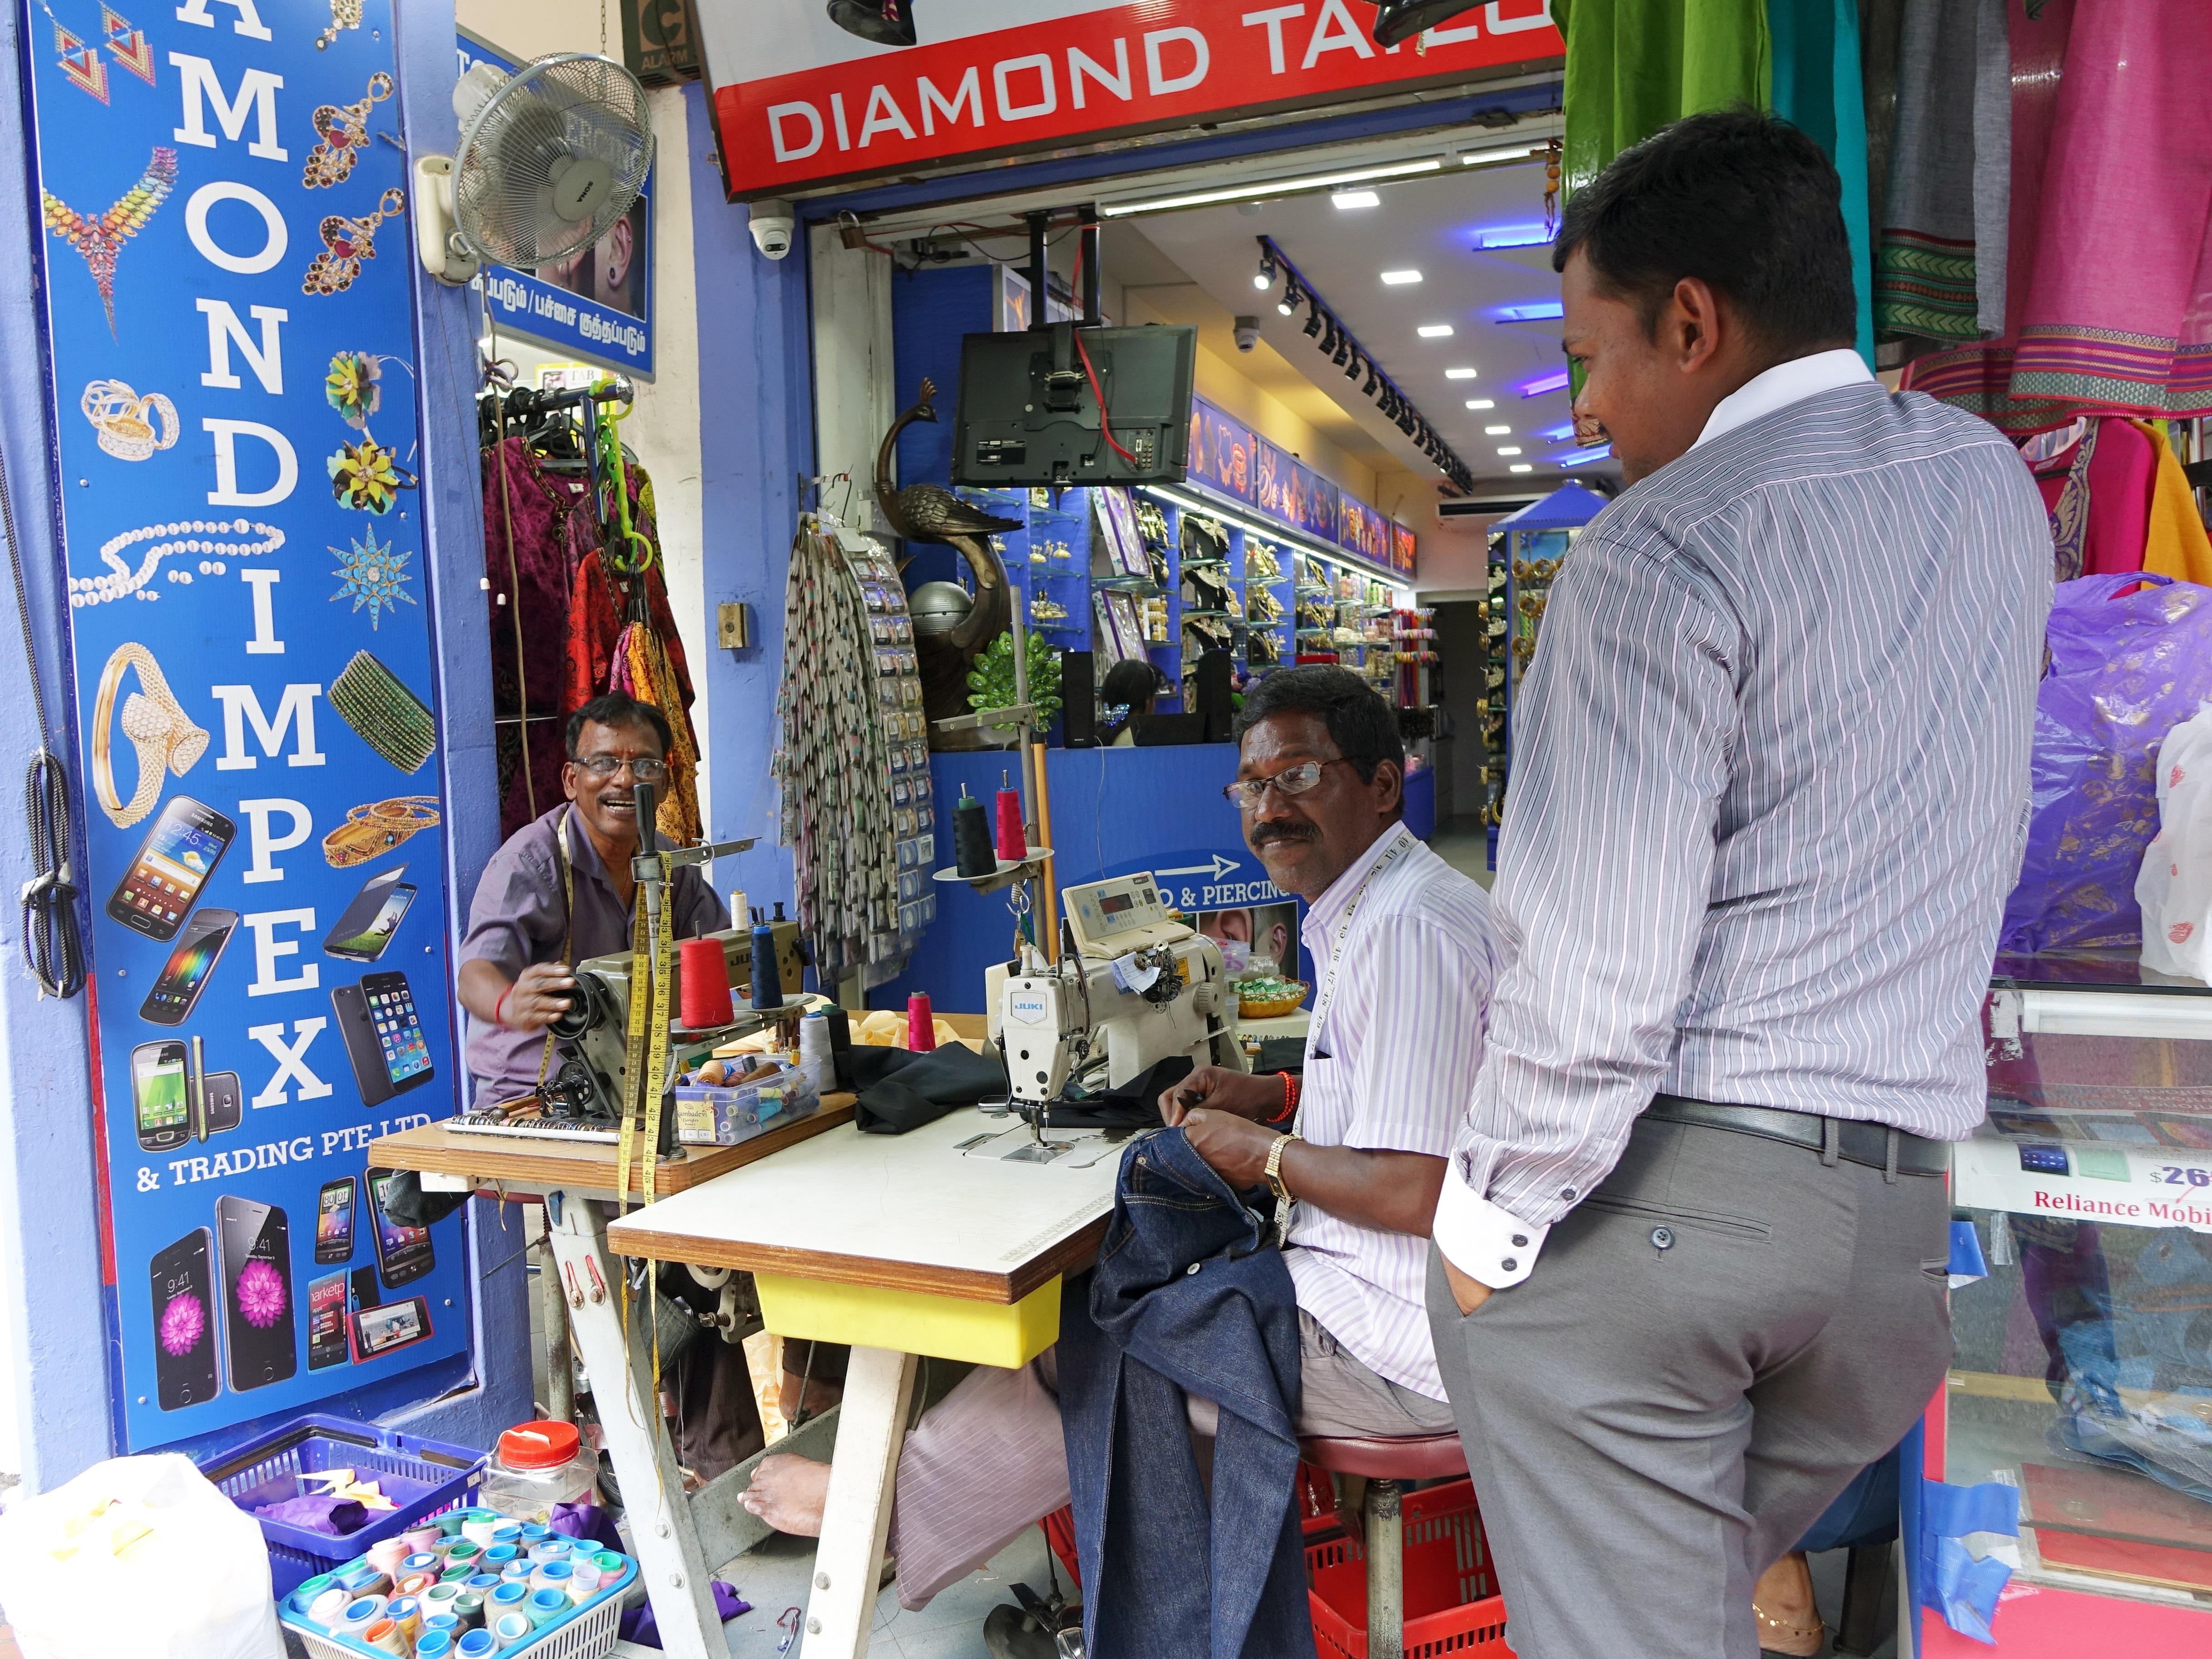 Free Images : man, working, people, shop, vendor, fashion